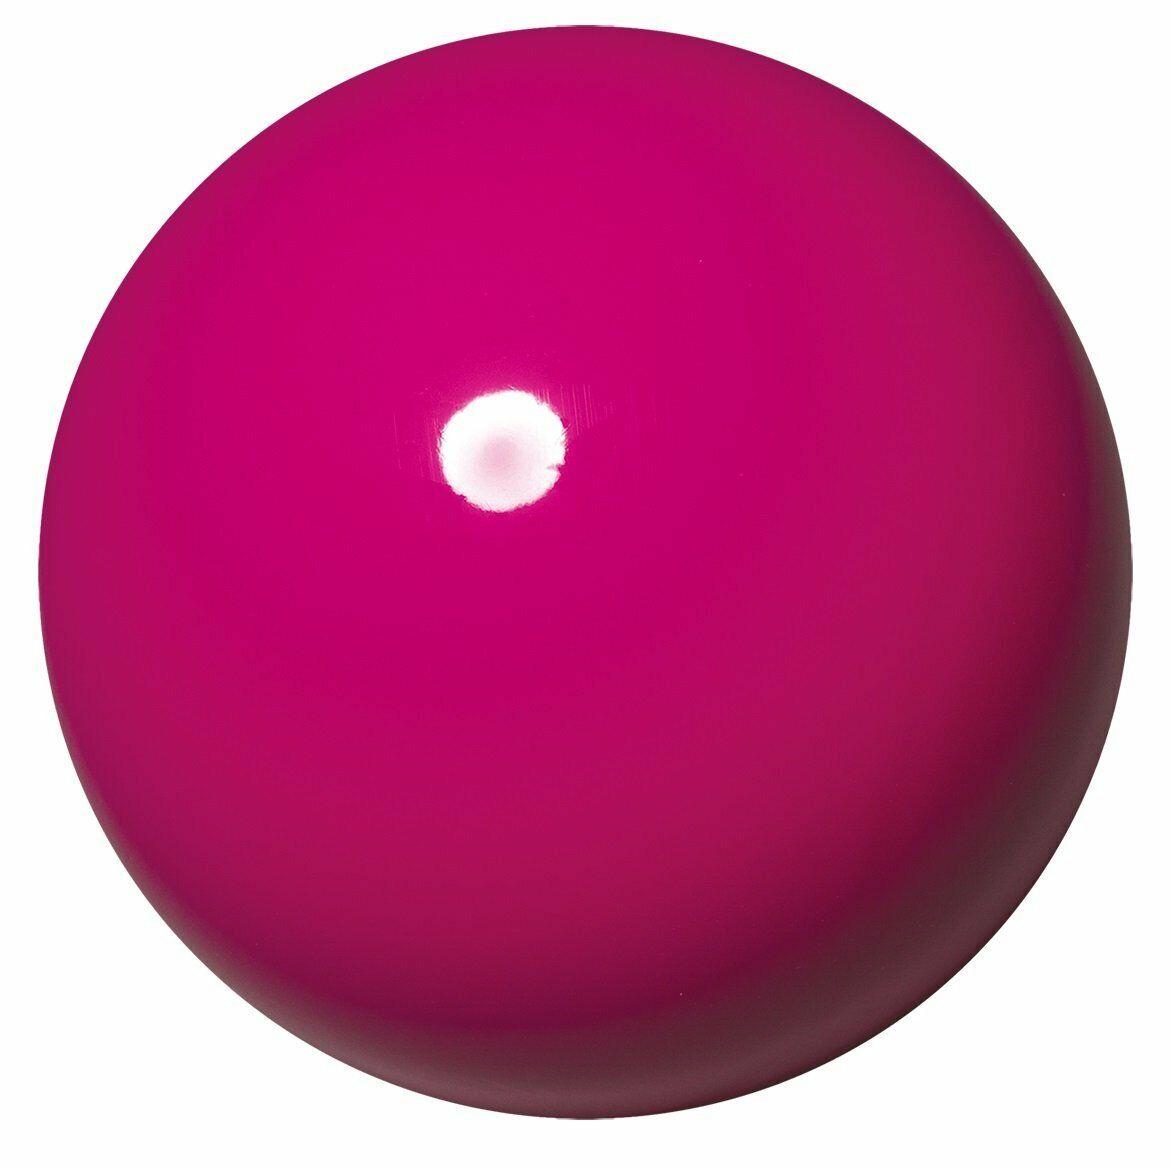 Sasaki Japan RG Rhythmic Gymnastics Gym Star Ball FIG  Approved M-20A-F Raspberry  cheap and high quality